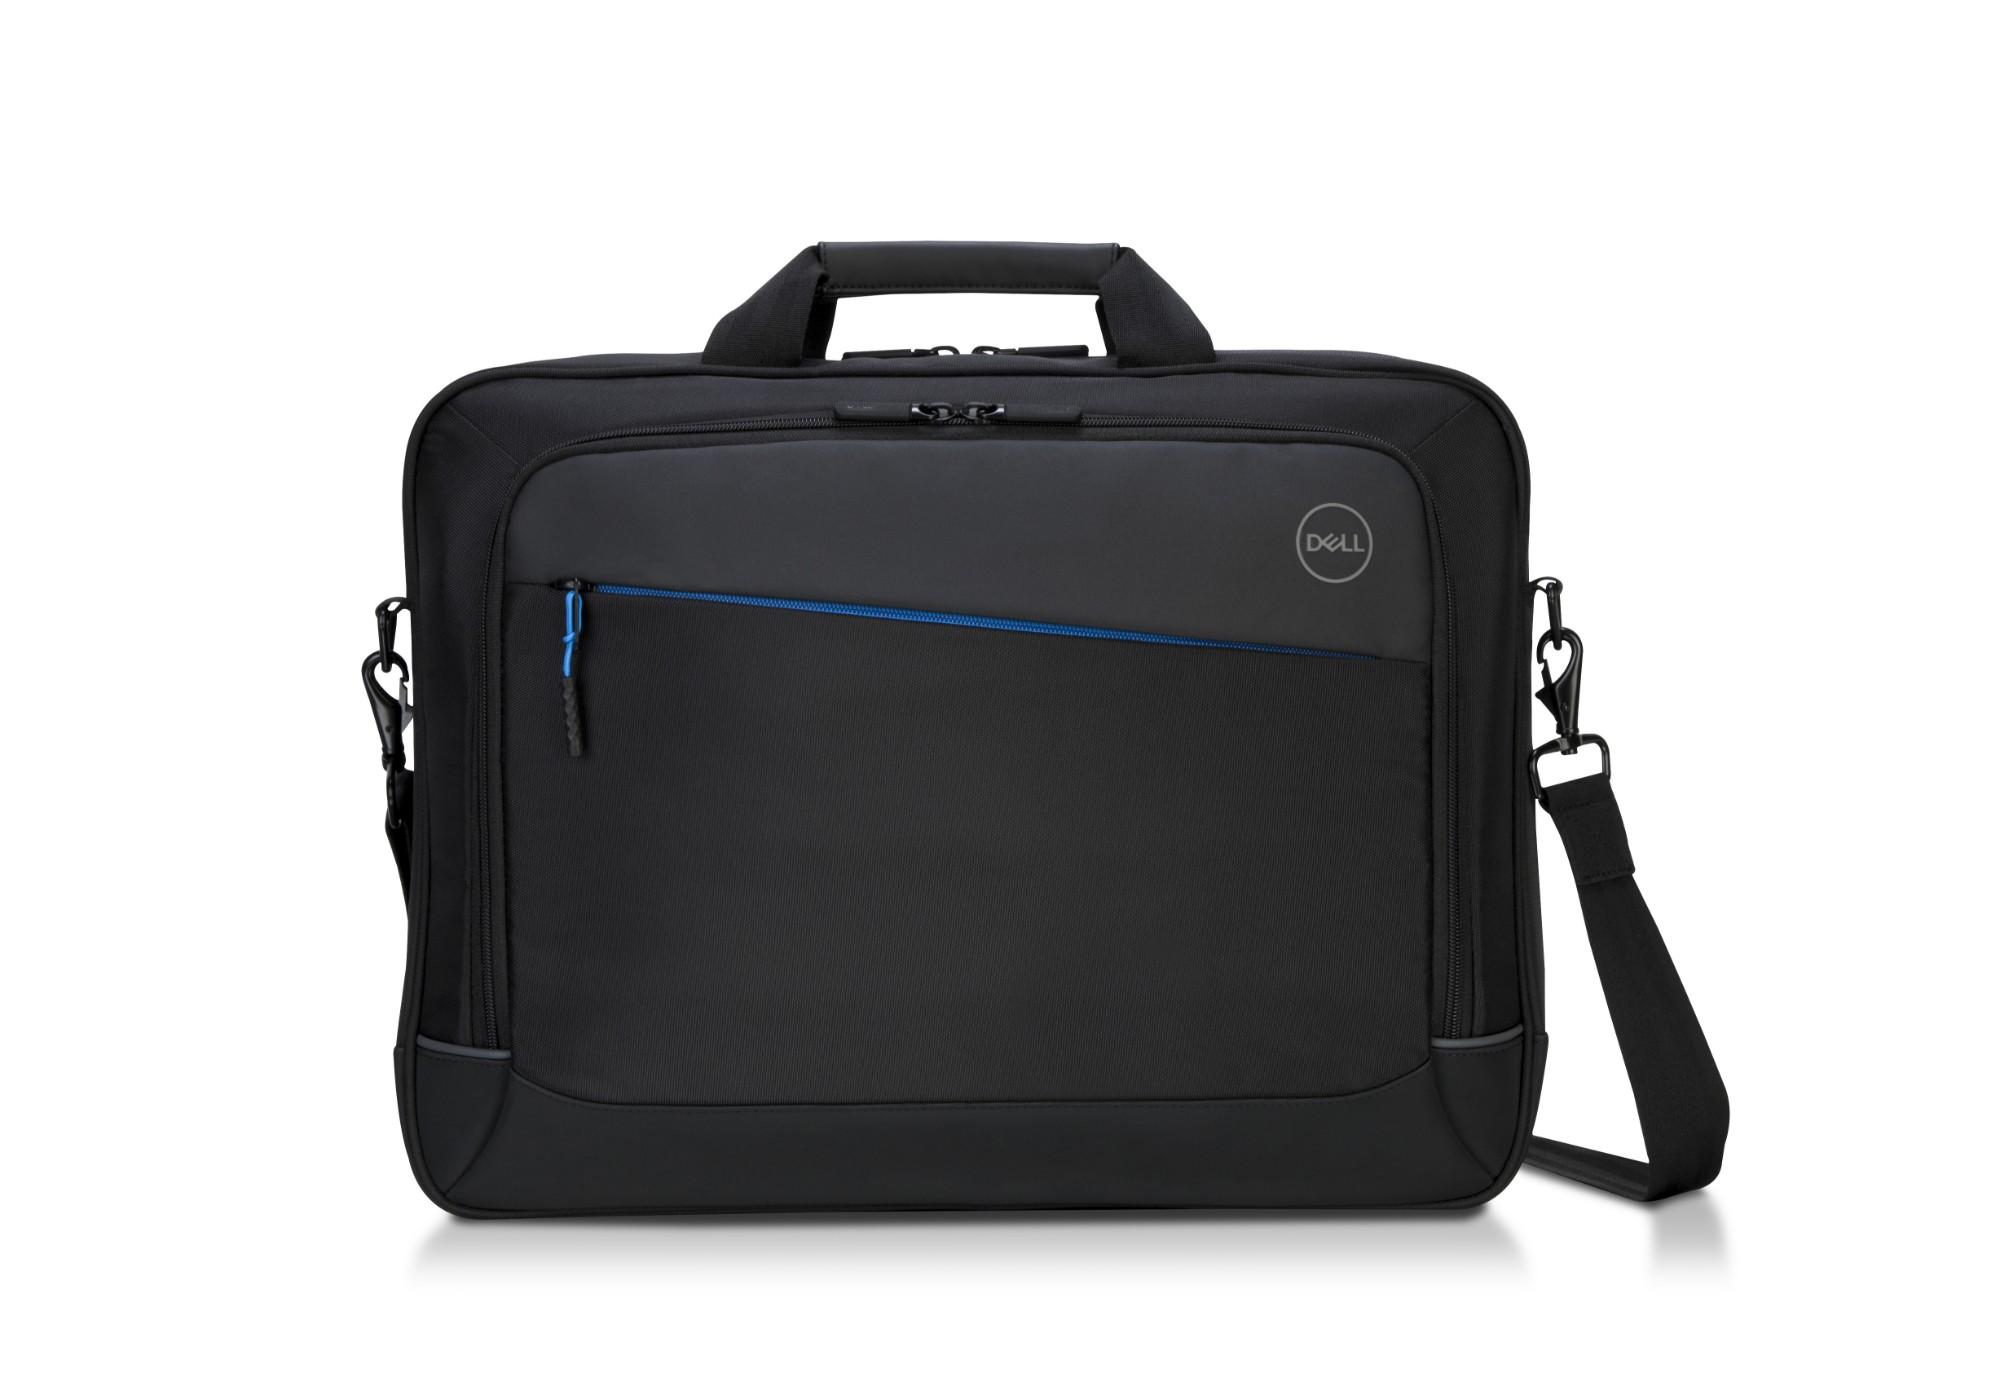 DELL PF-BC-BK-5-17 notebook case 38.1 cm (15